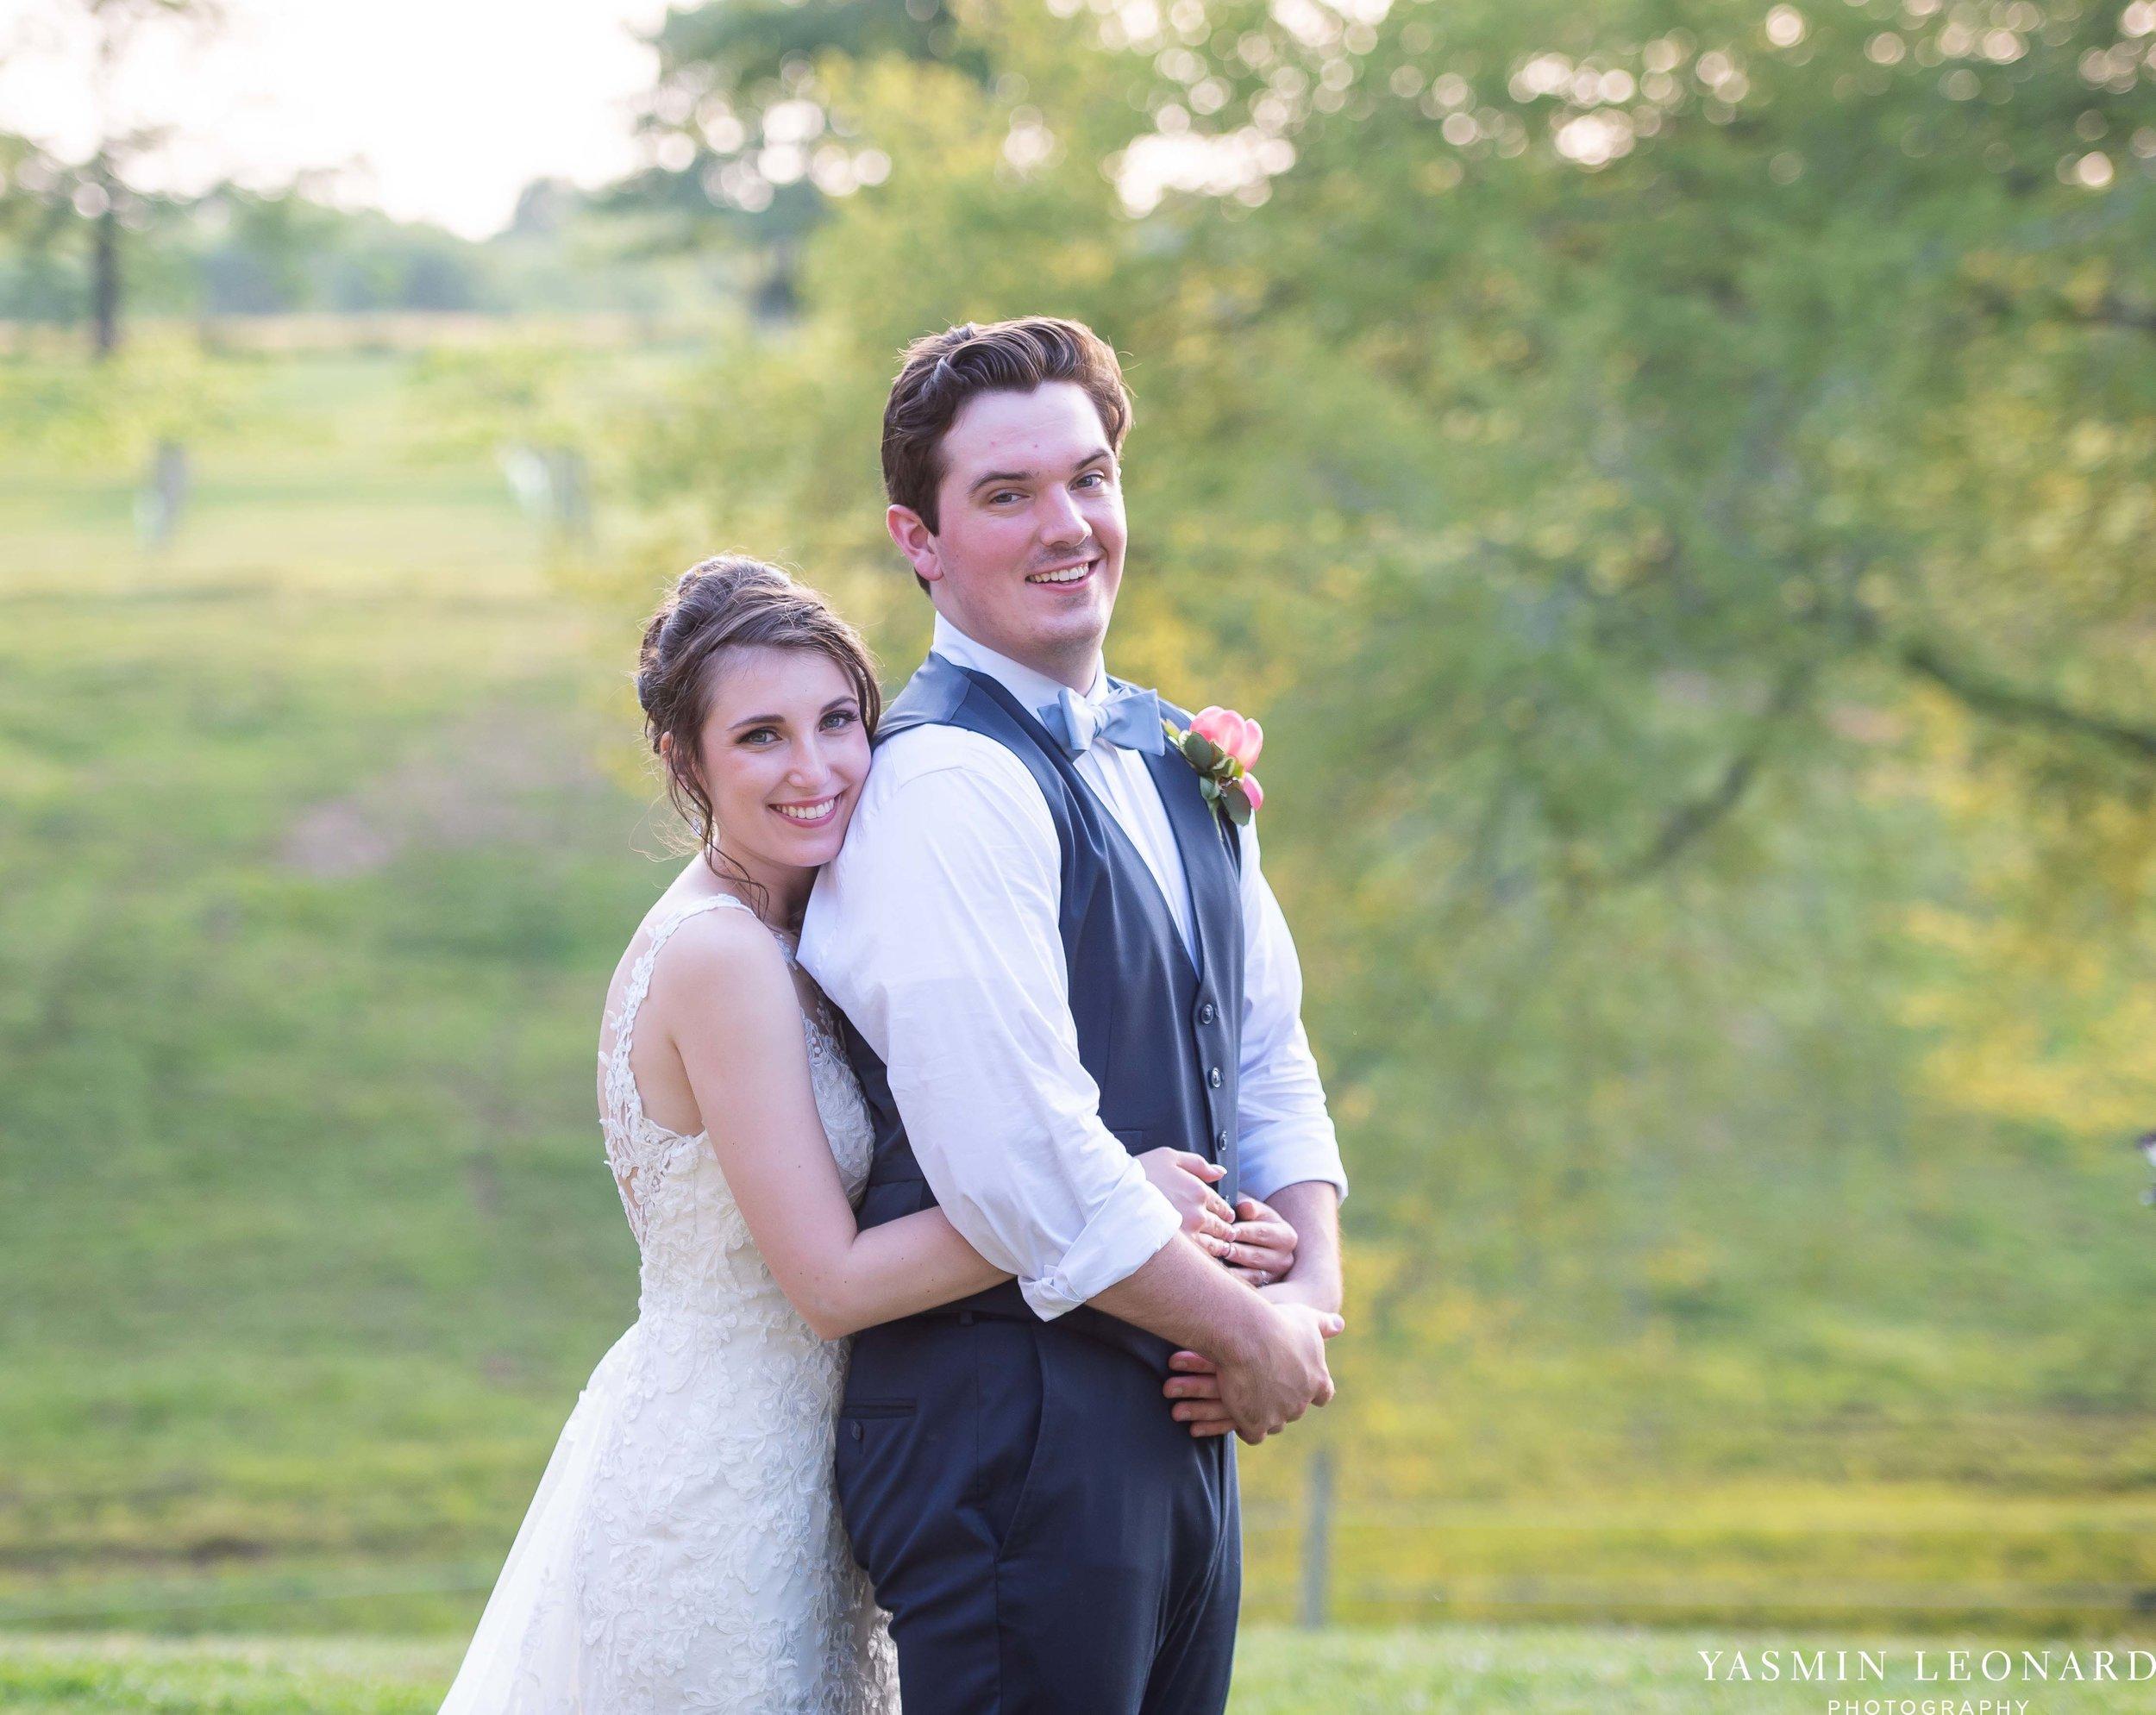 Old Homeplace Vineyard - NC Weddings - Outdoor Summer Weddings - Peony Boutique - Vineyard Wedding - NC Photographer - Yasmin Leonard Photography-54.jpg